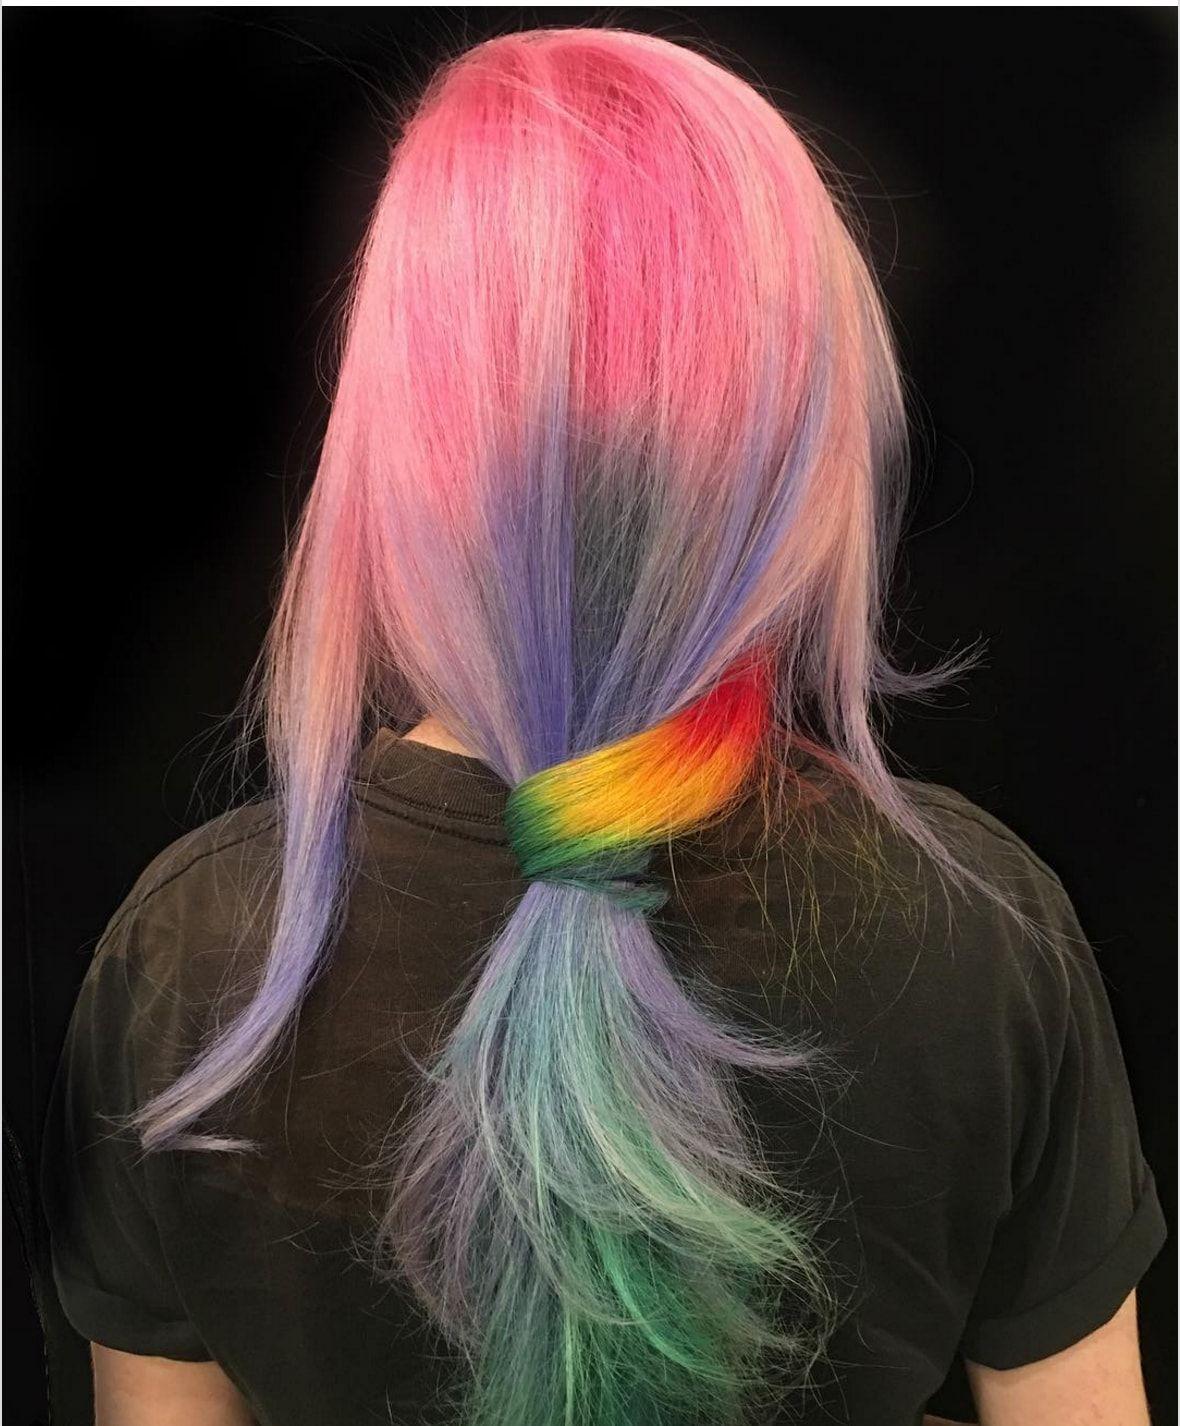 15 Gorgeous Hair Highlight Ideas 2020 15 Gorgeous Pastel Hair Color | New HAIR STYLES 2020 | Pastel hair